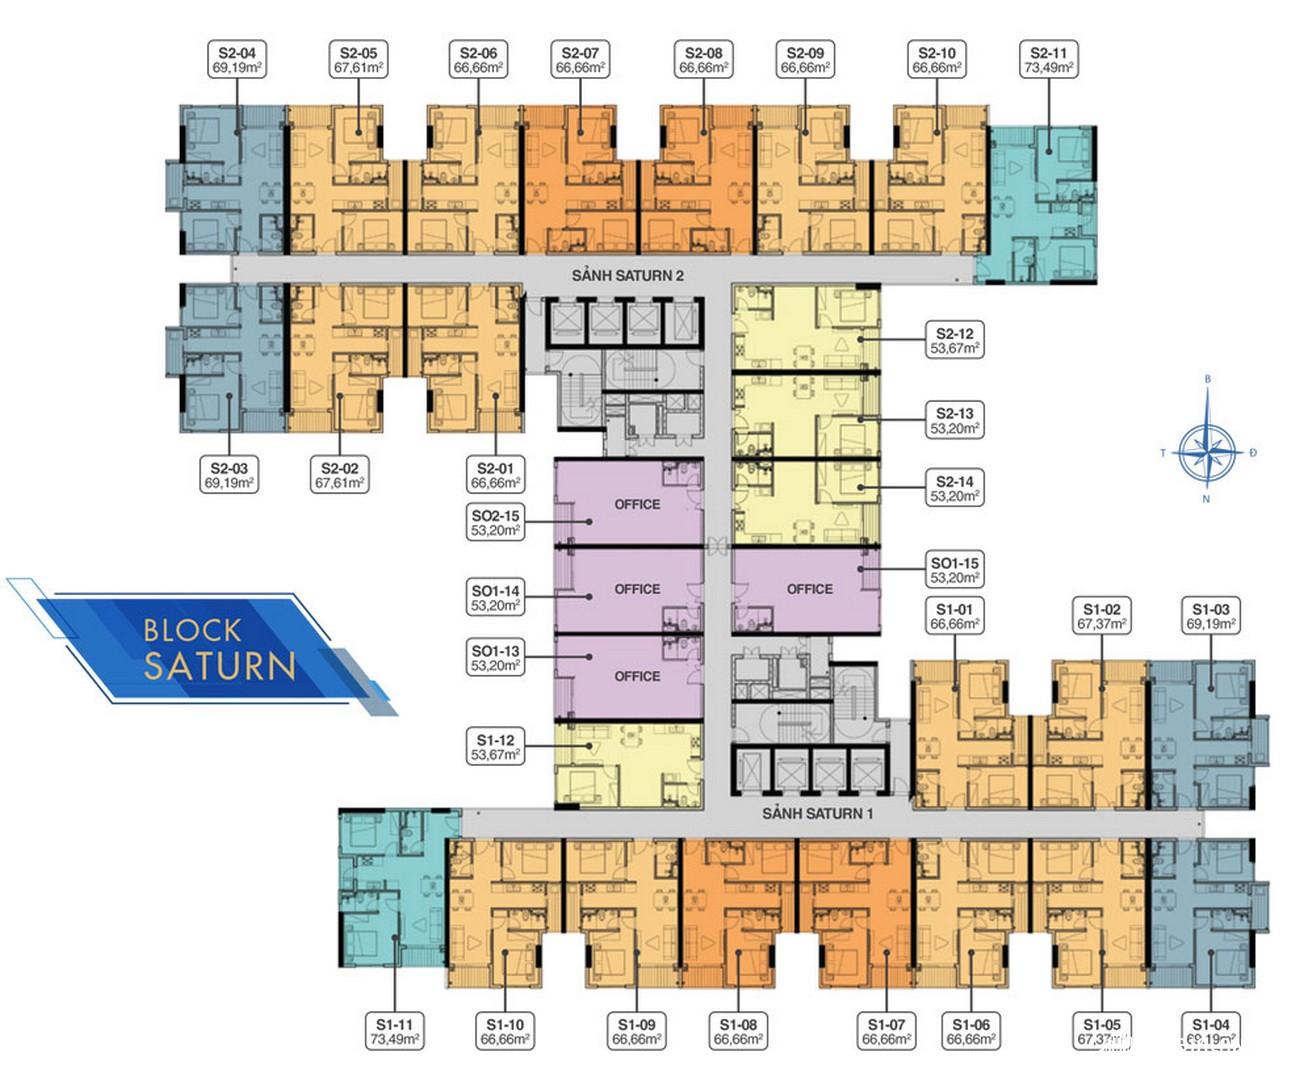 Mặt bằng tầng 5 Block Saturn Q7 Riverside Complex